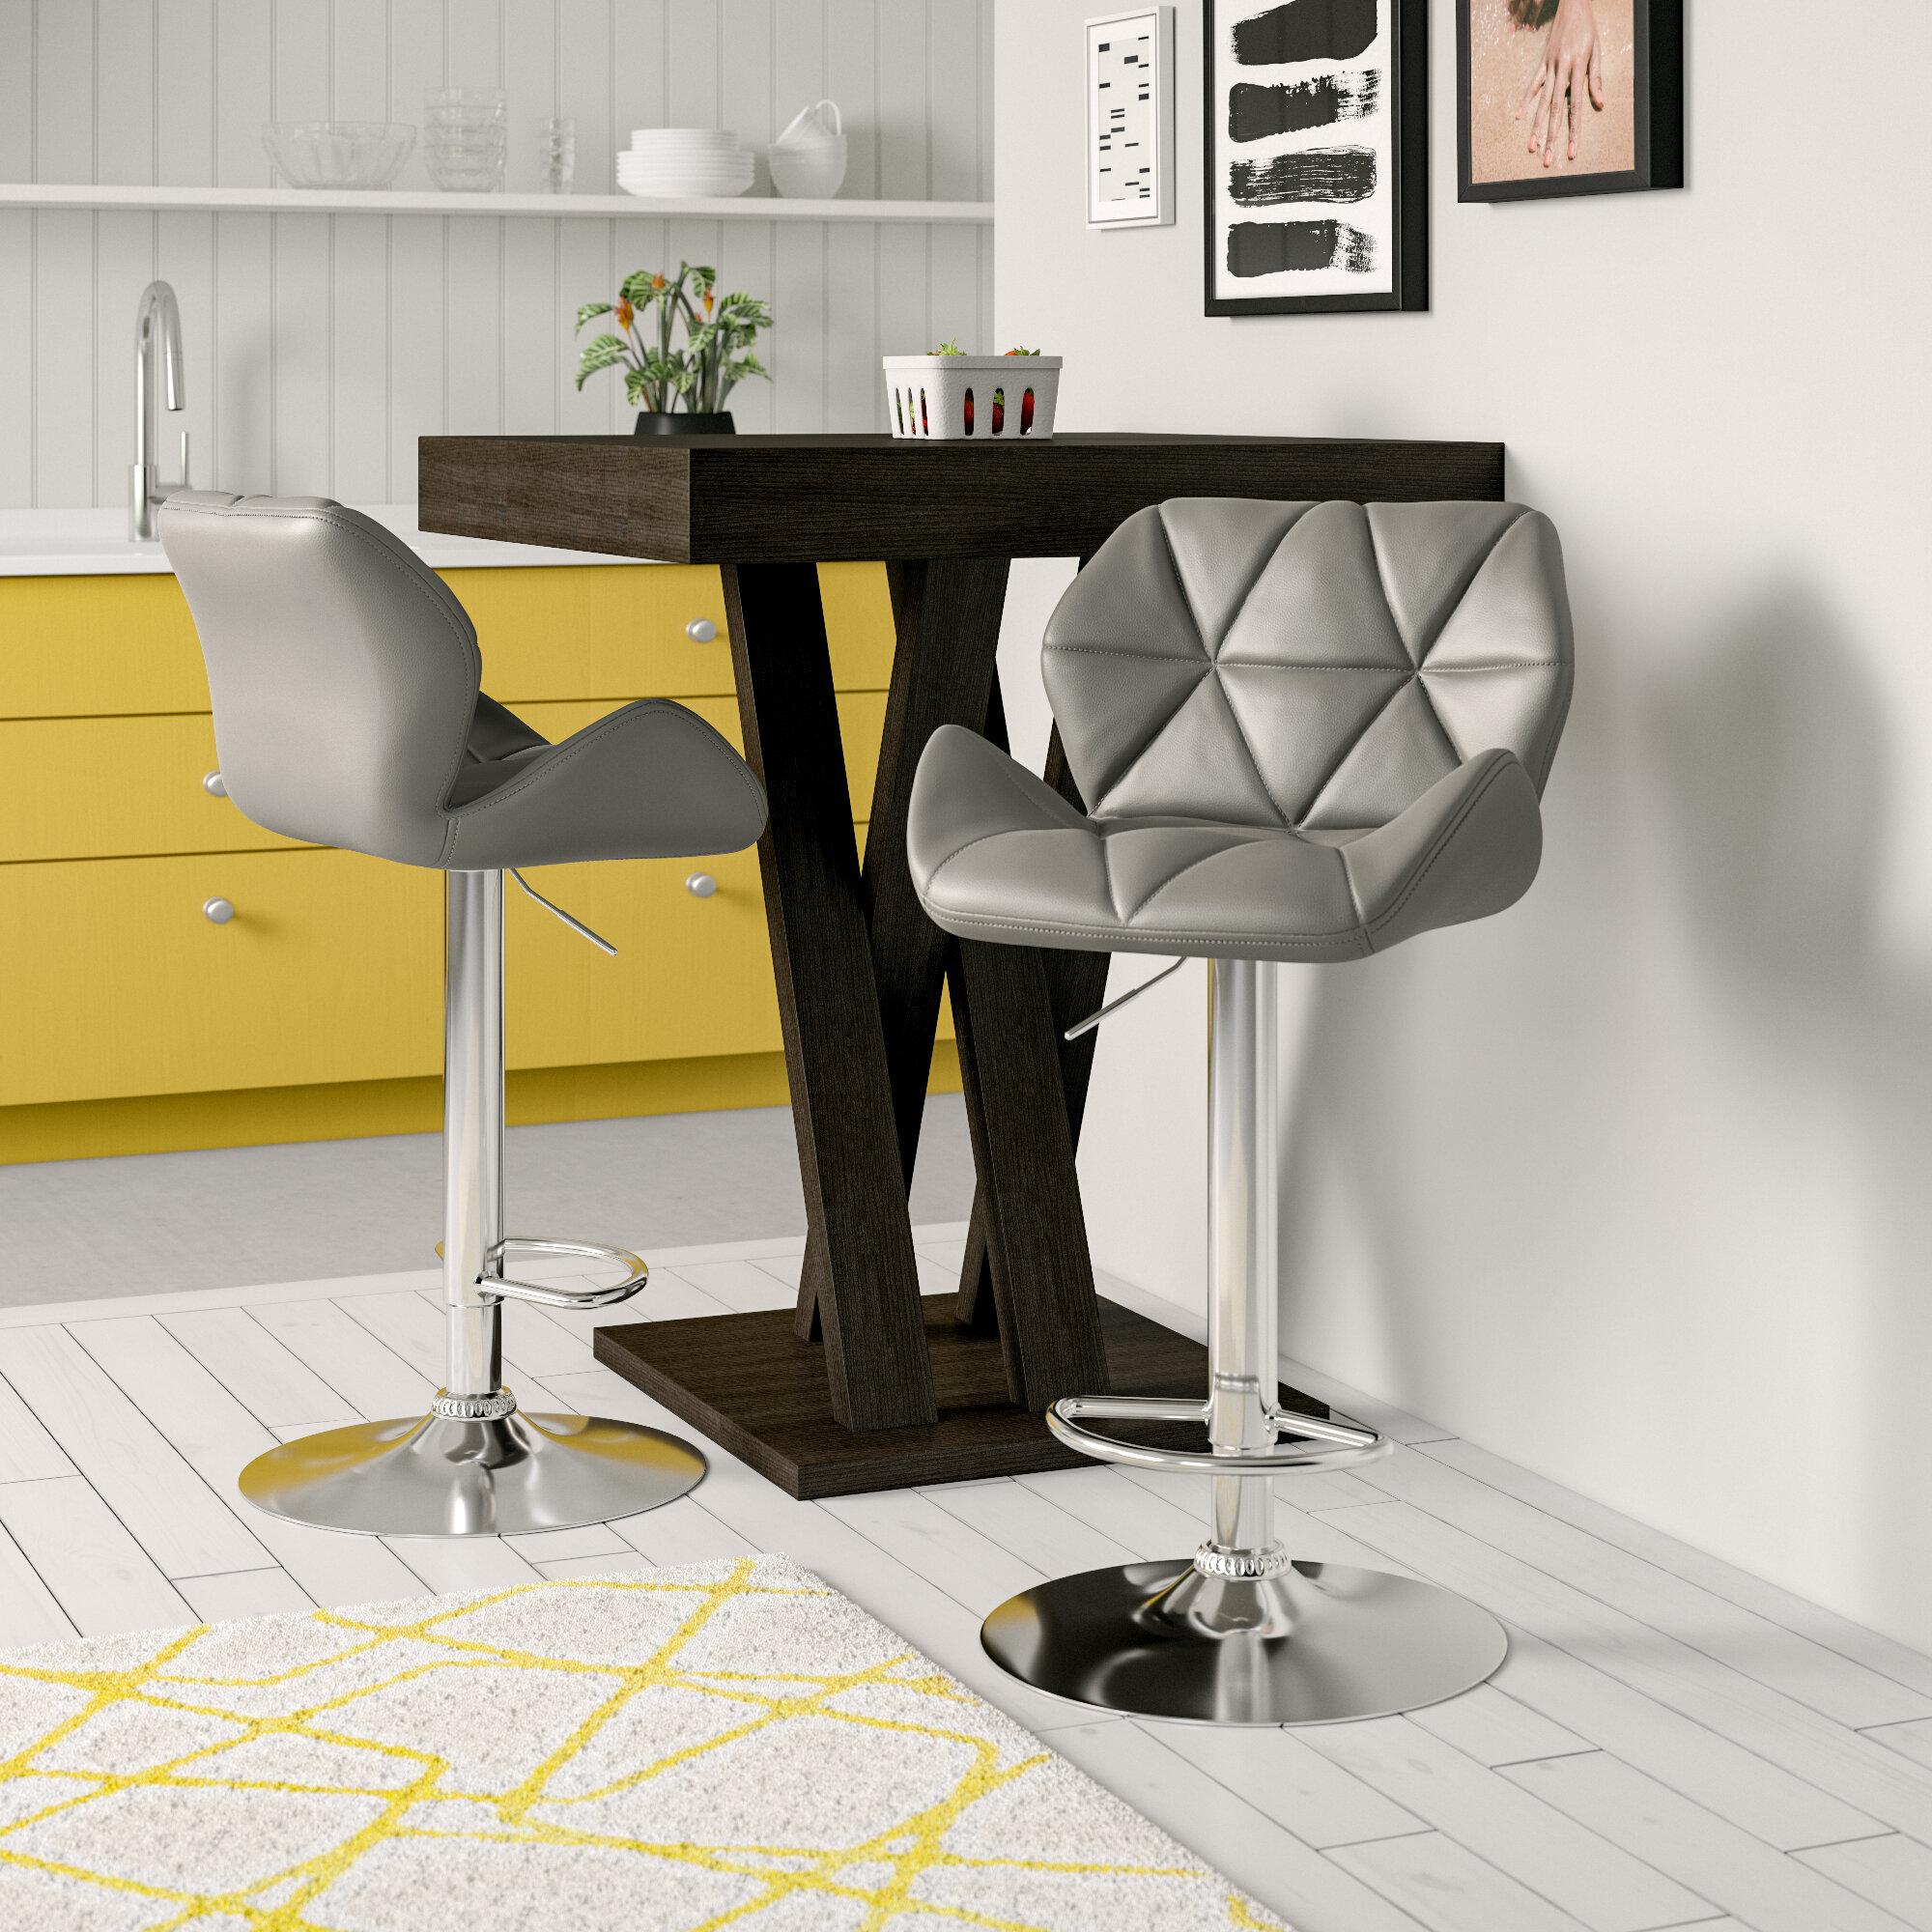 Fantastic Marceline Hydraulic Adjustable Height Swivel Bar Stool Ncnpc Chair Design For Home Ncnpcorg